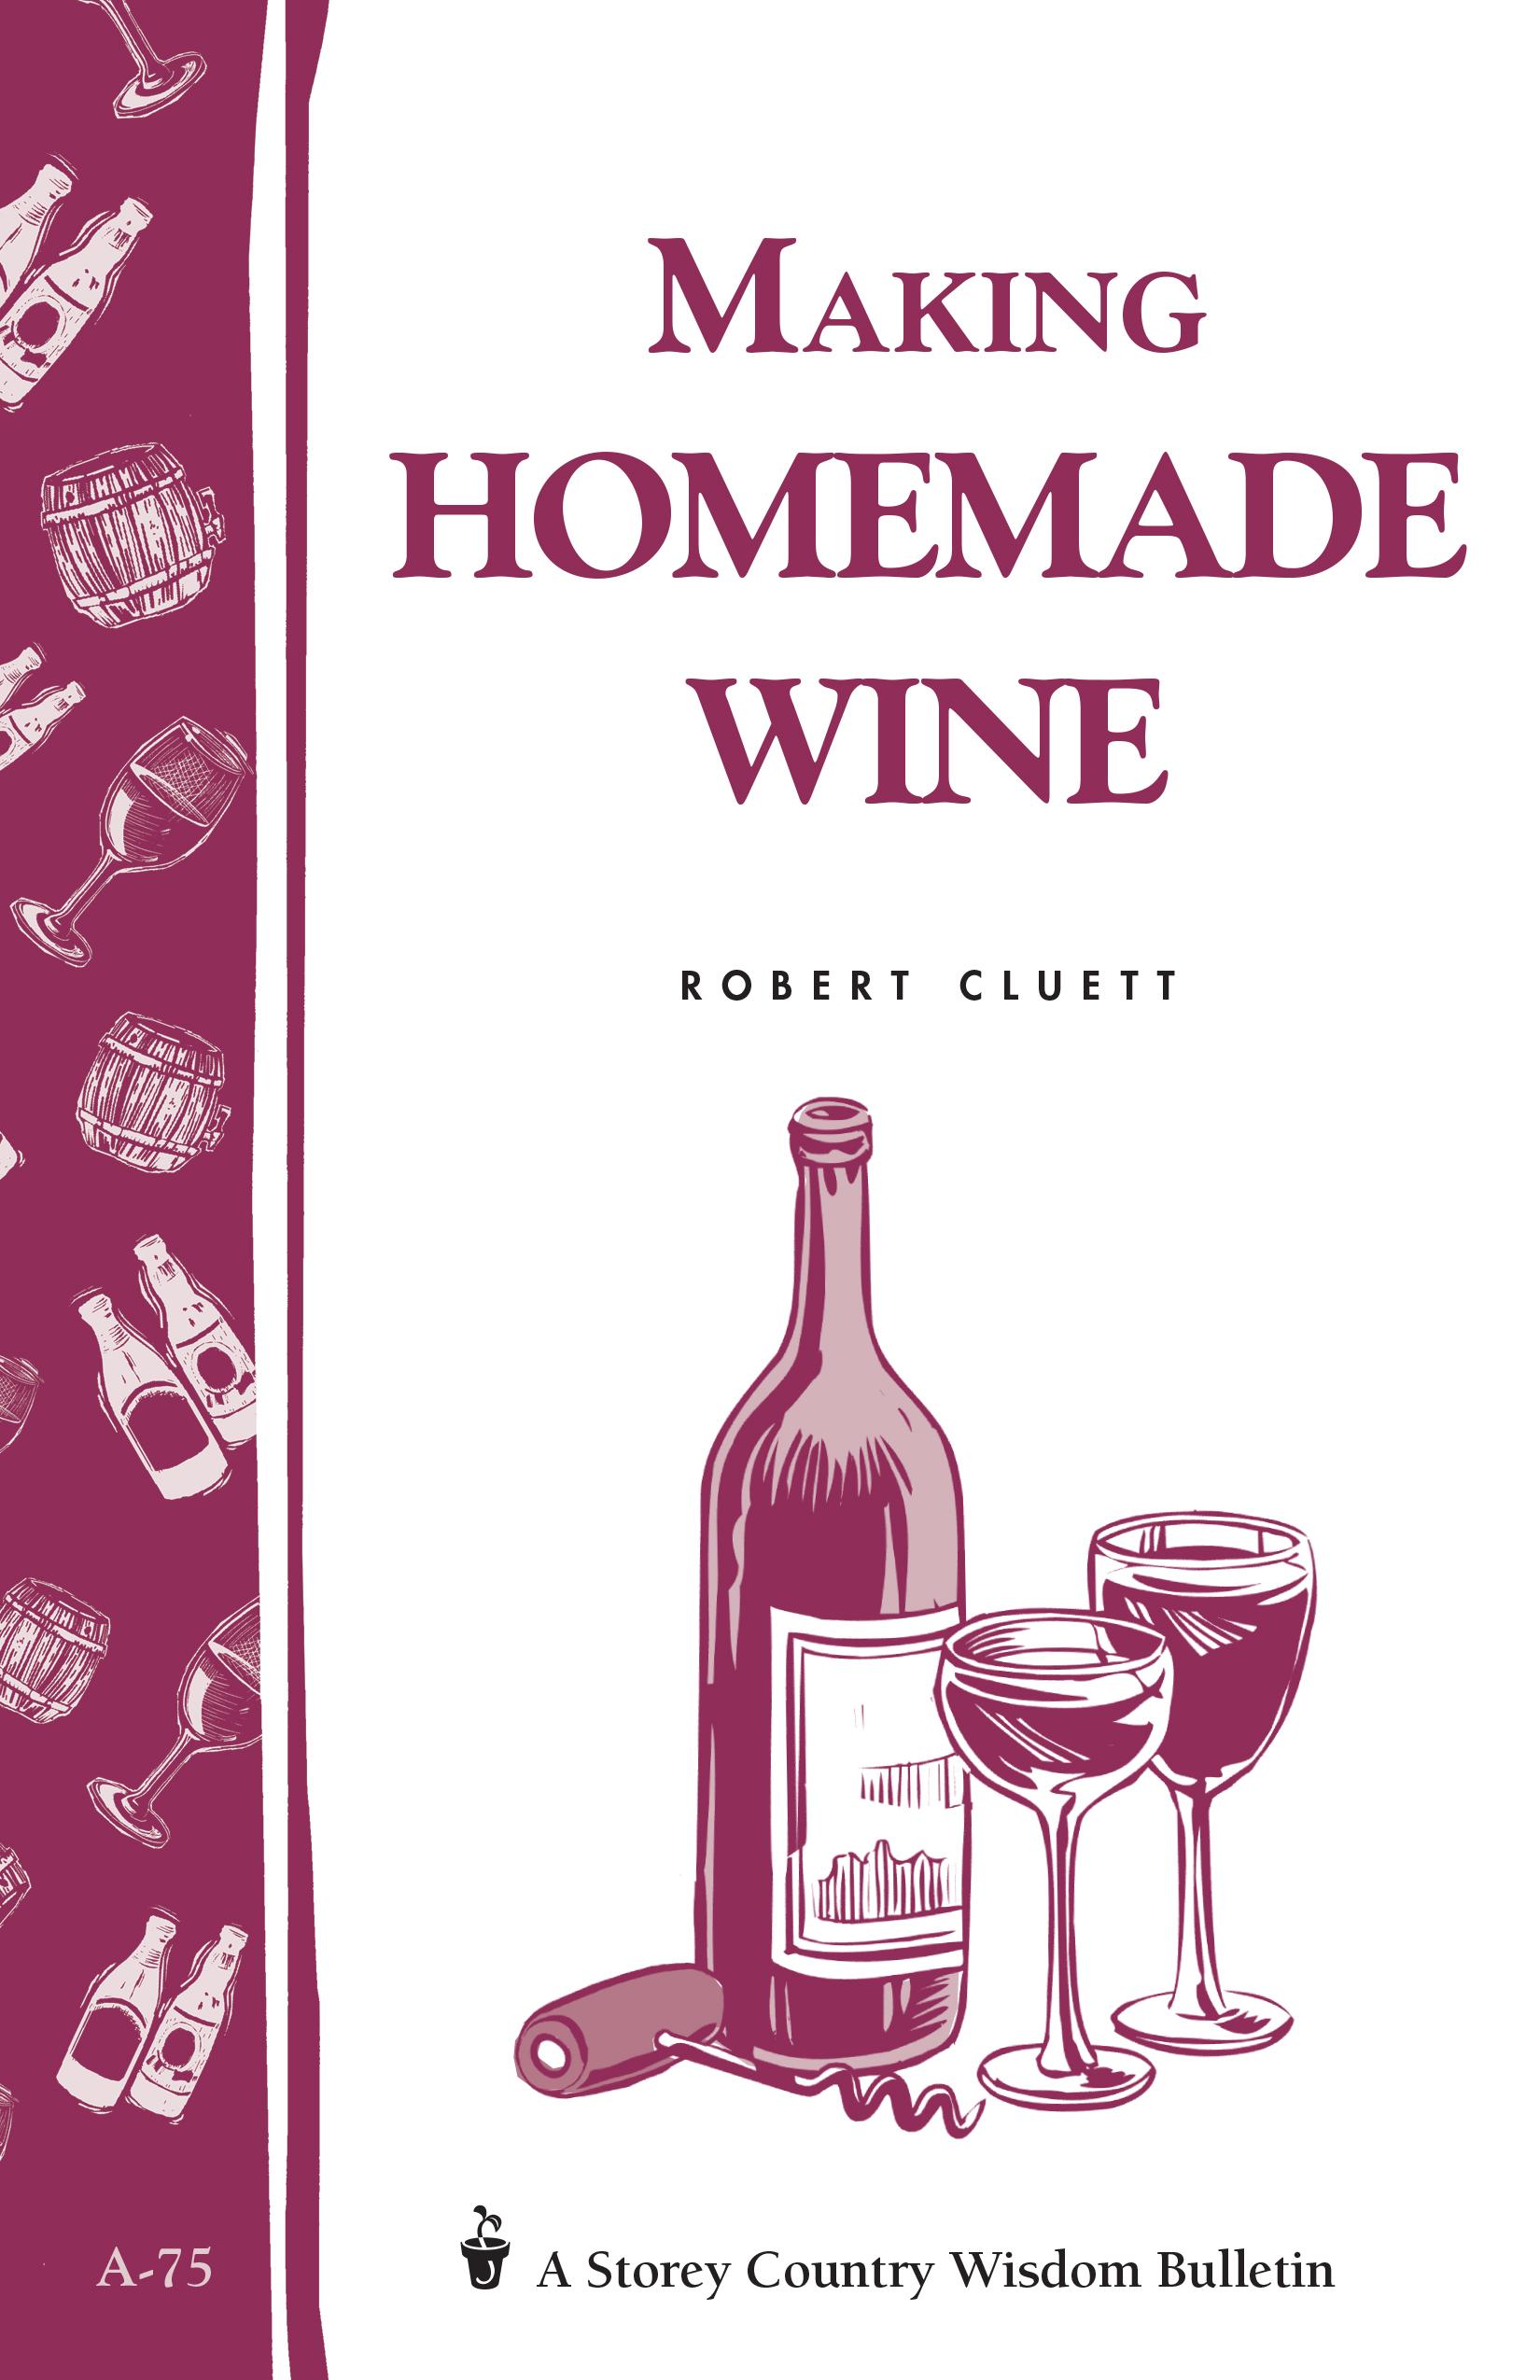 Making Homemade Wine Storey's Country Wisdom Bulletin A-75 - Robert Cluett